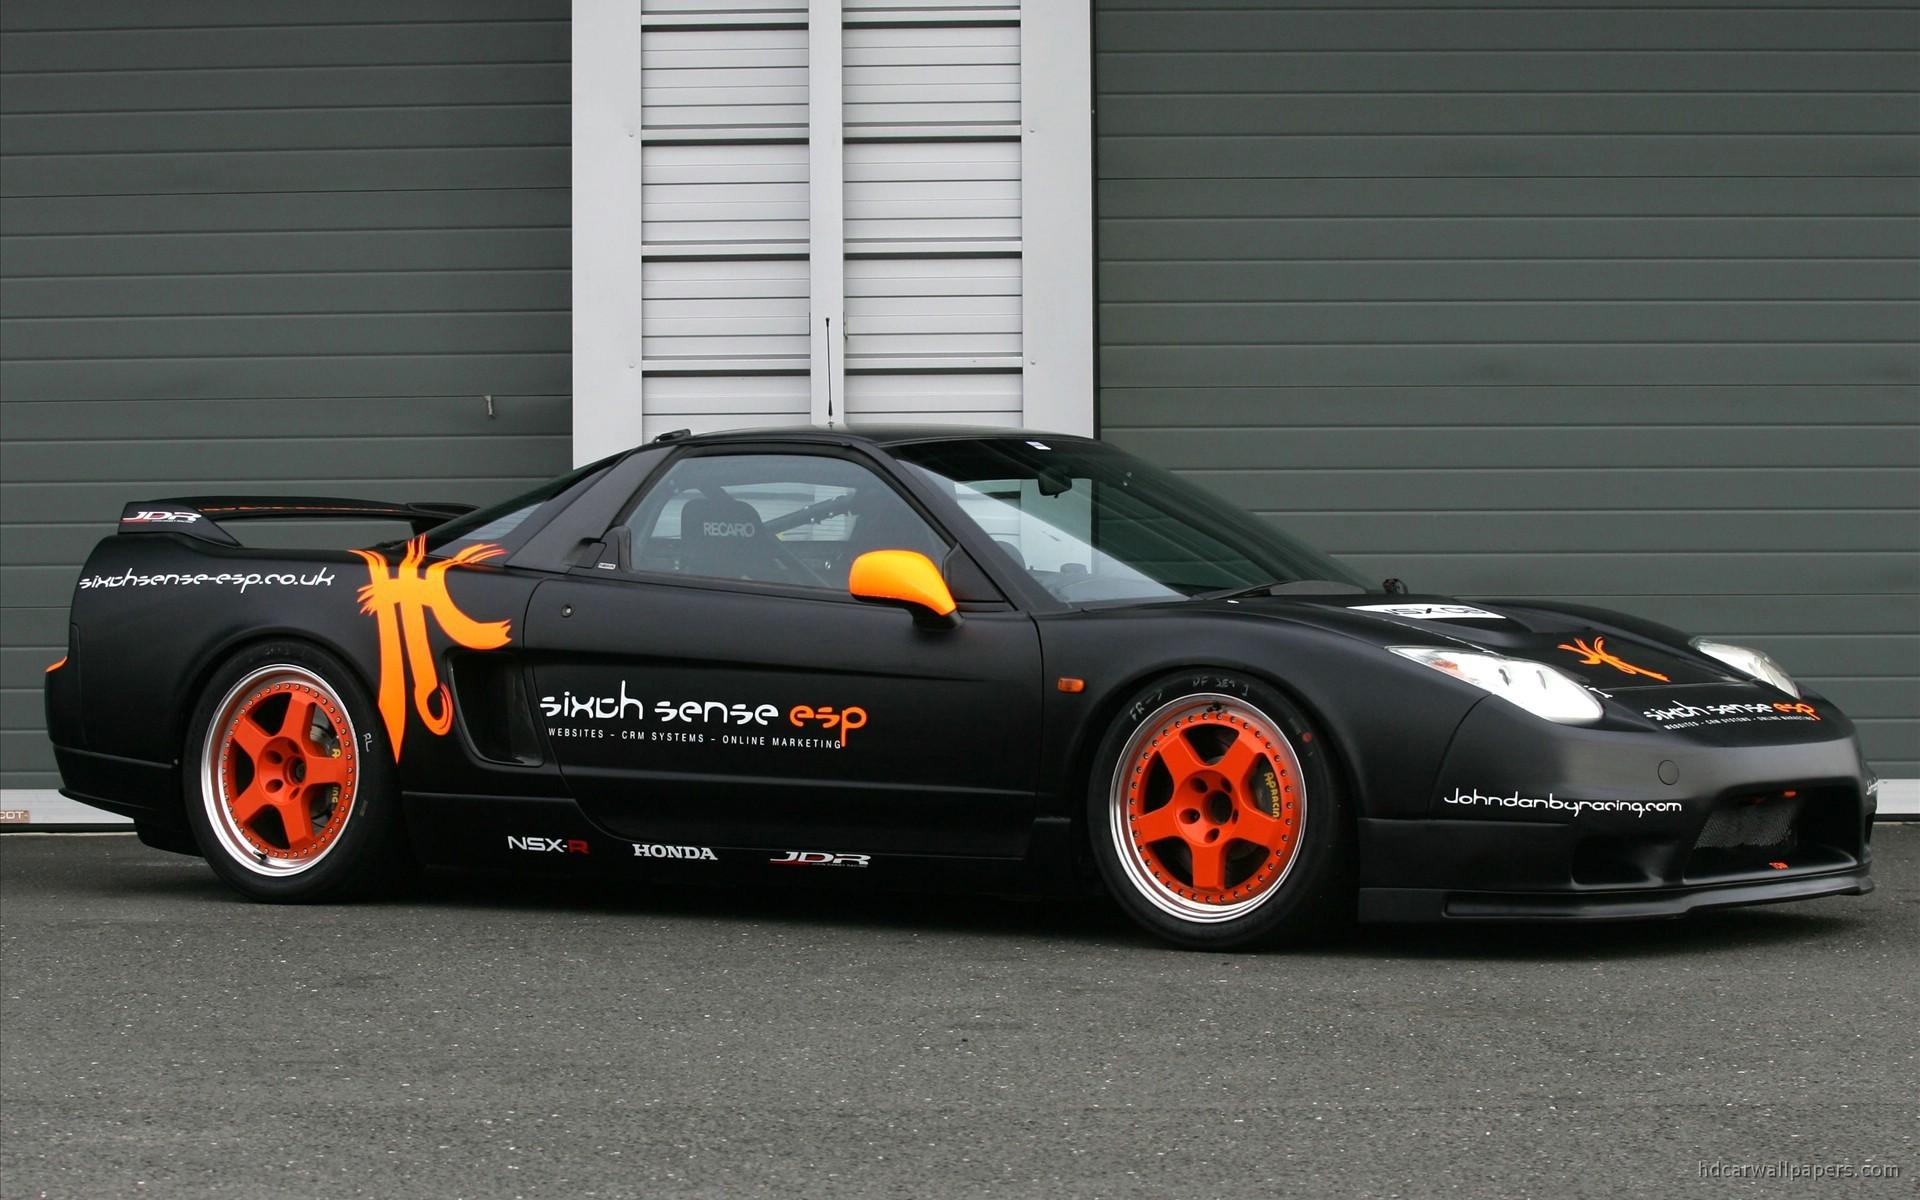 Honda Nsx By John Danby Racing 3 Wallpaper Hd Car